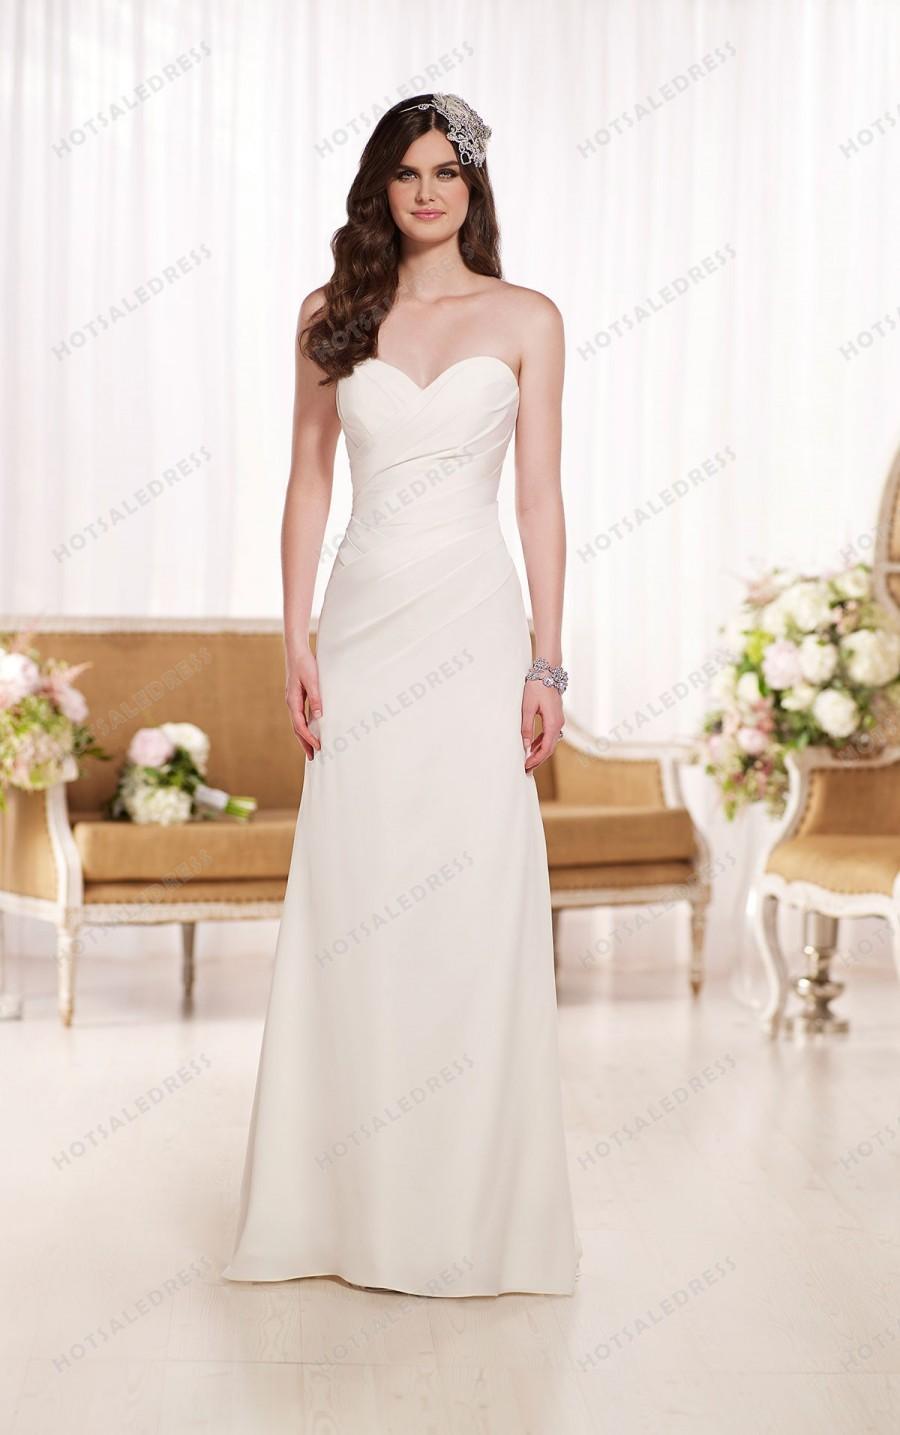 Wedding Gowns Australian Designers Ficts